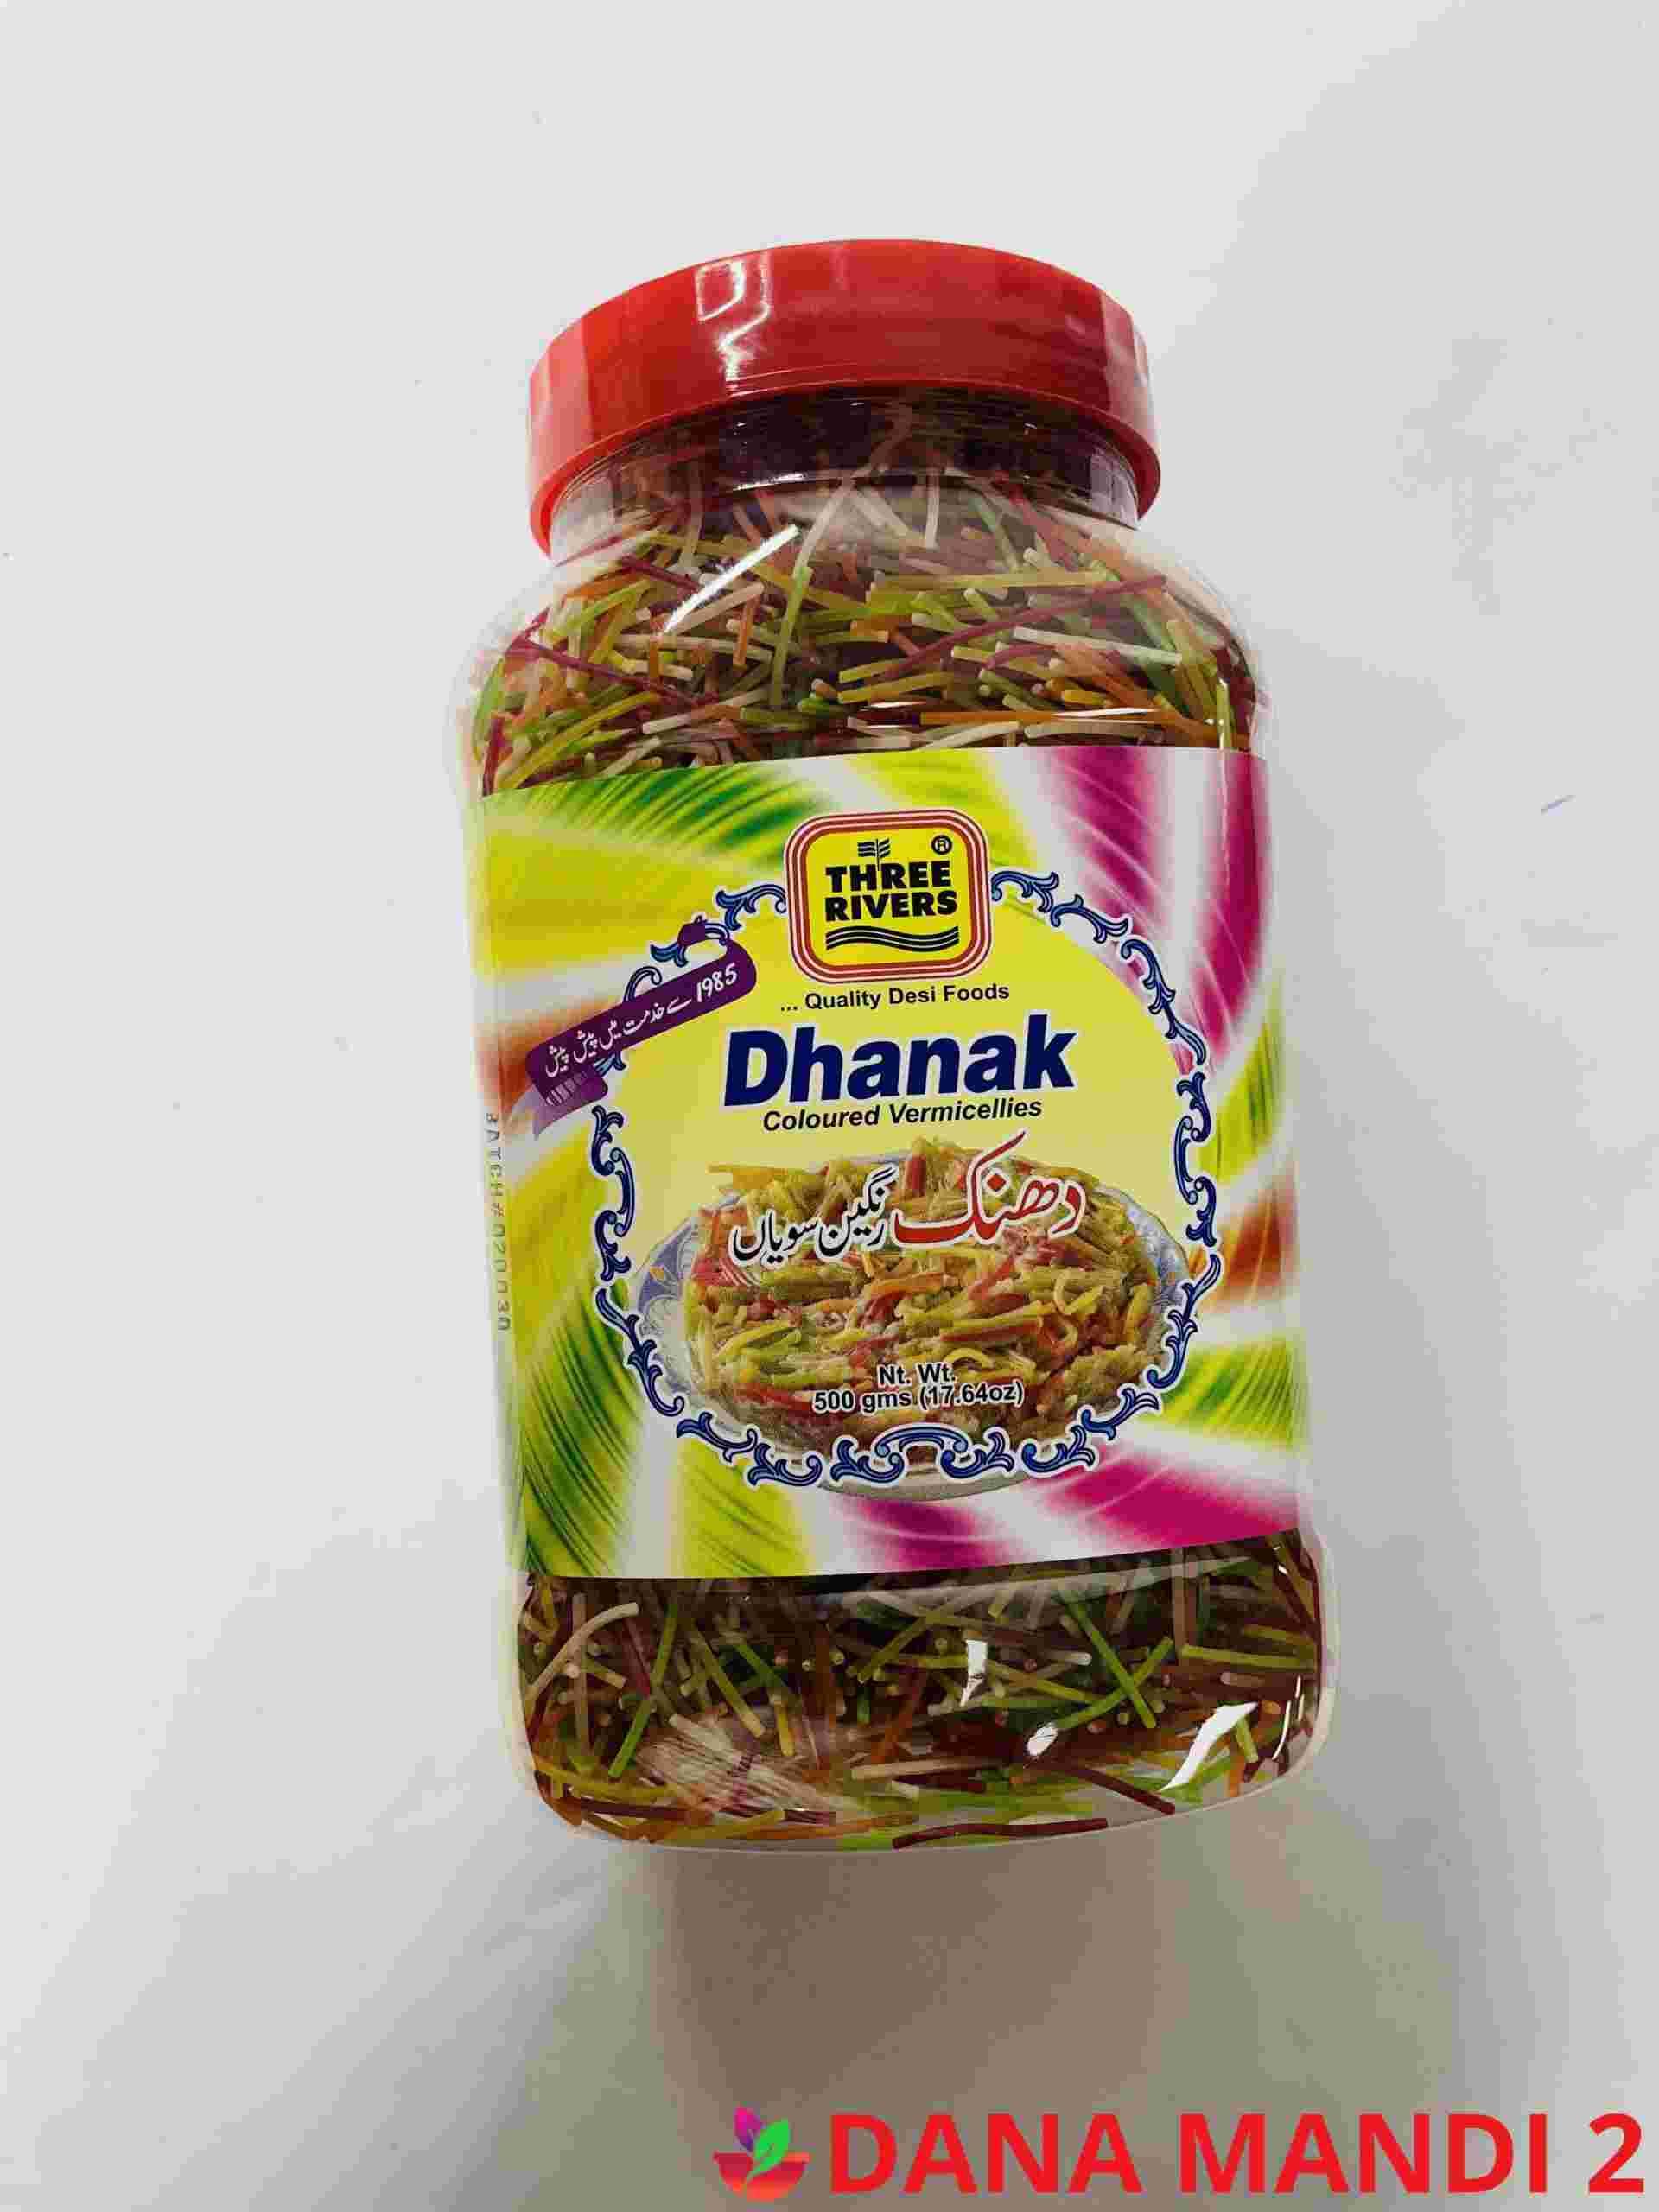 THREE RIVER Dhanak Colured Vermicellies